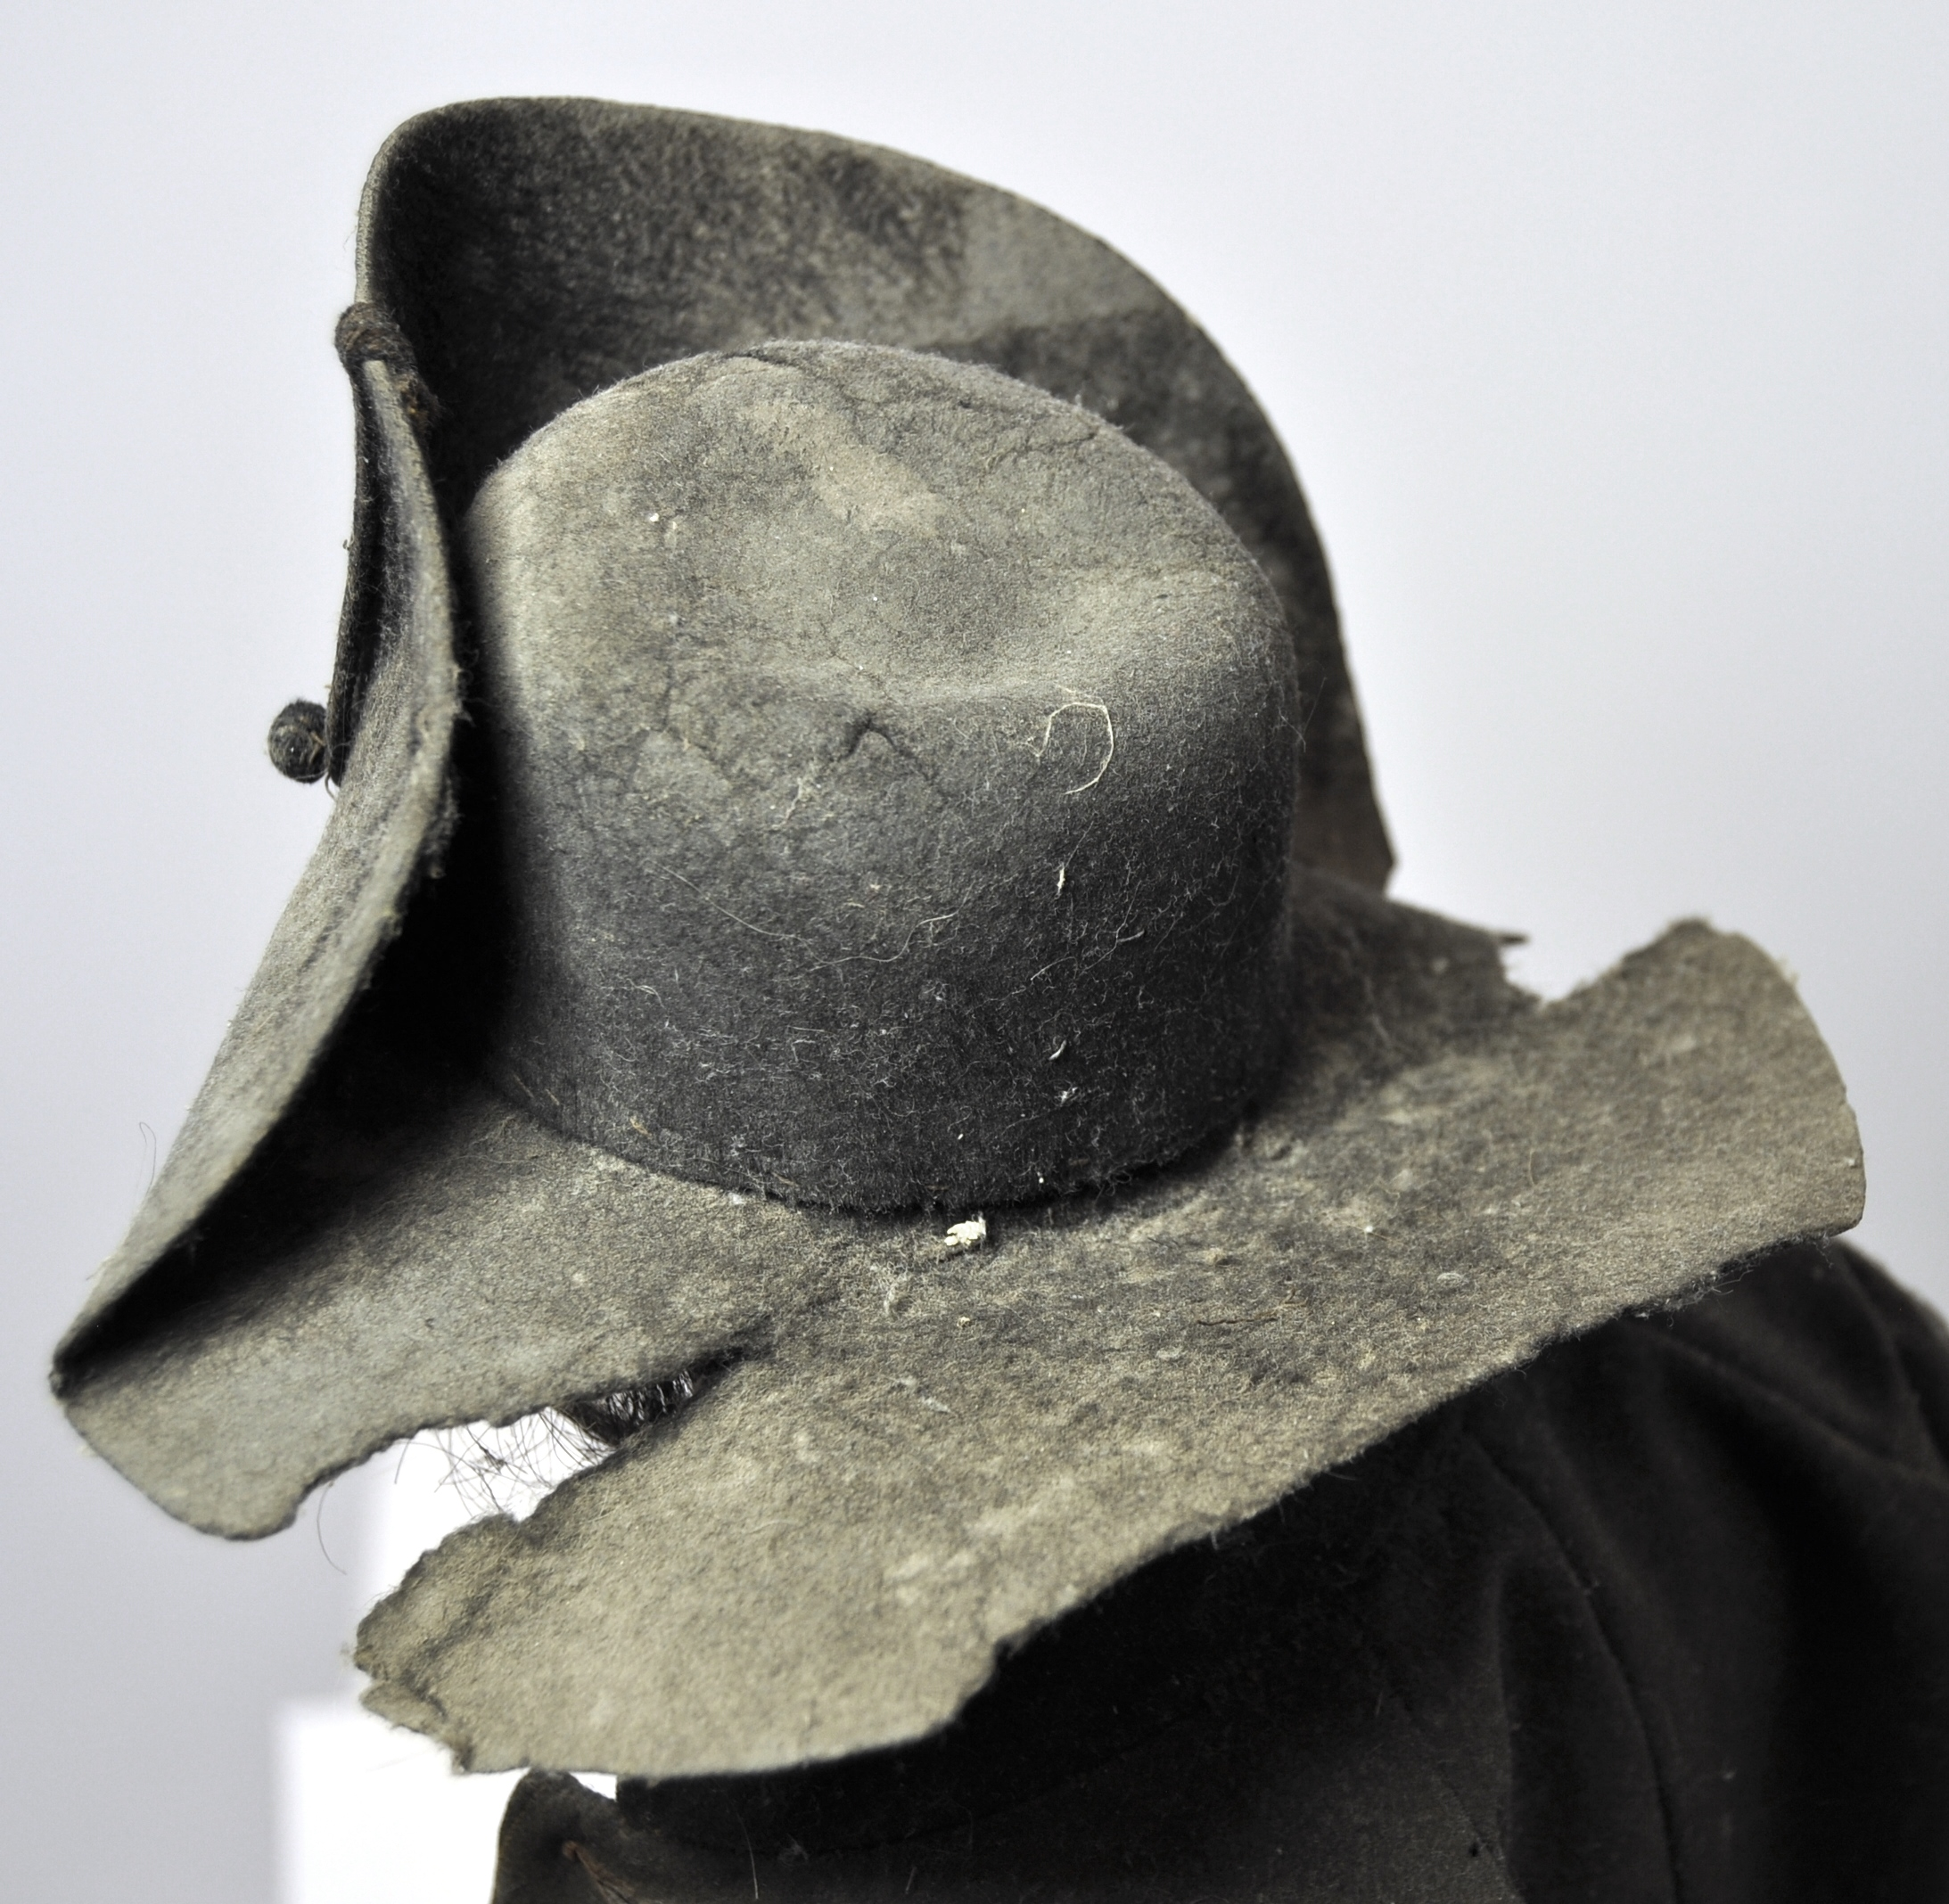 The wool felt bicorn hat, before conservation